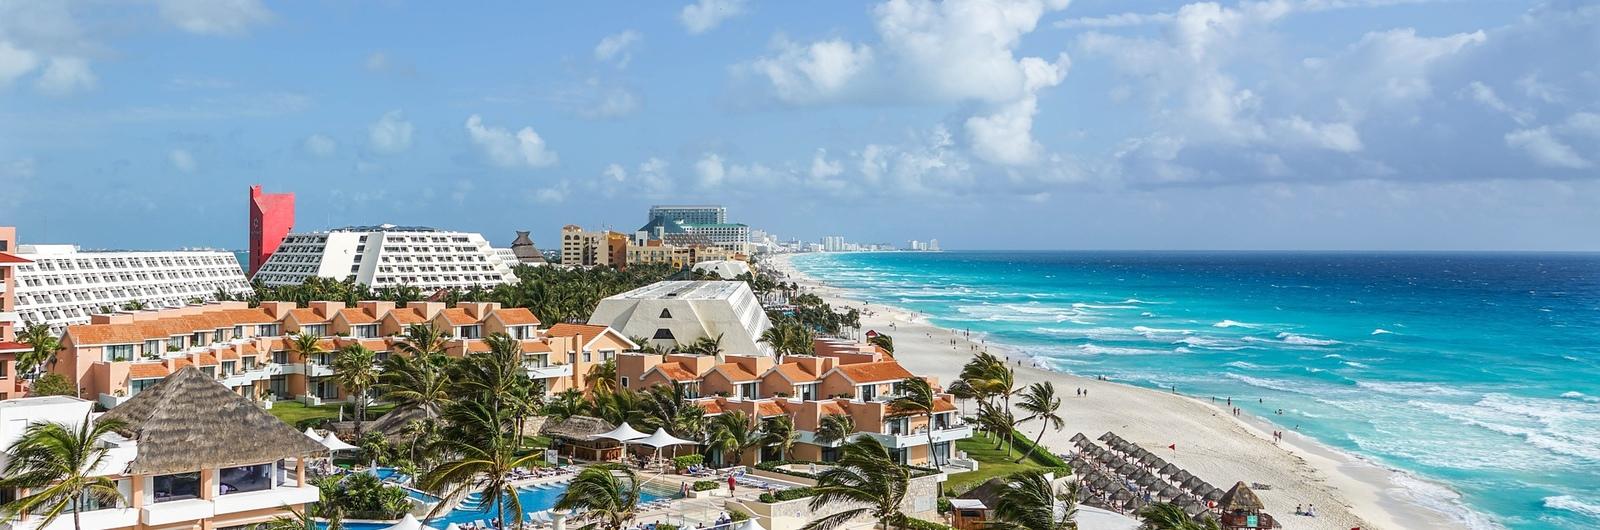 cancun city header